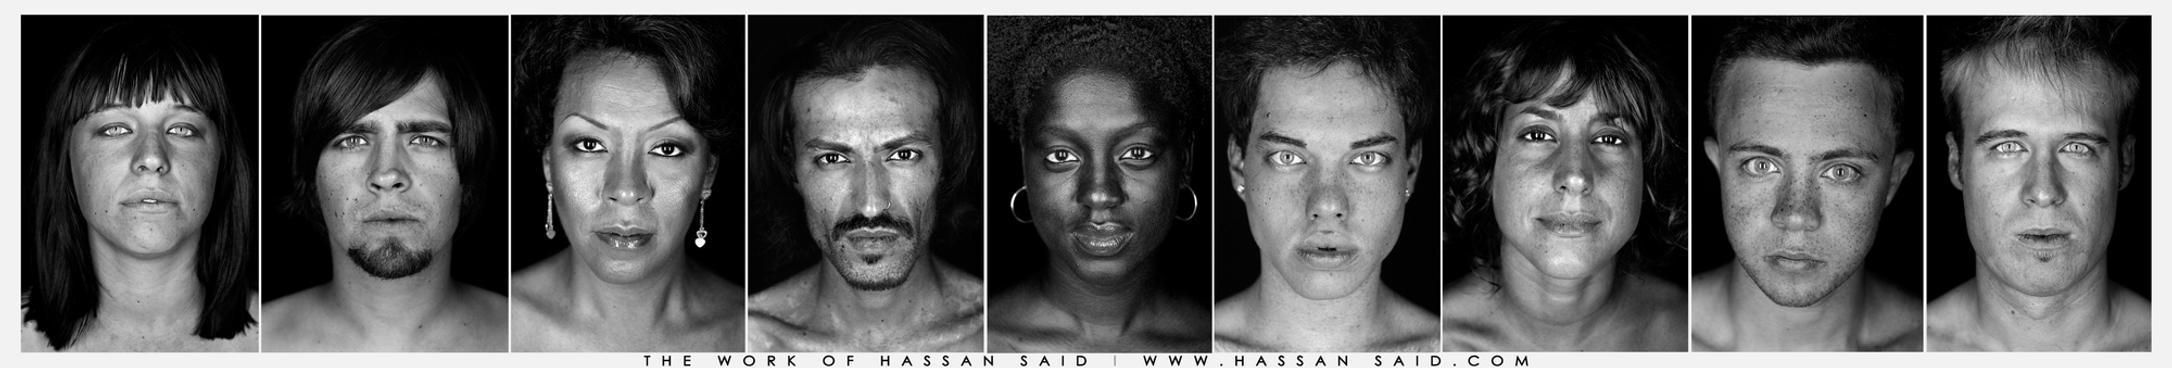 Human-ity by anaelmasri